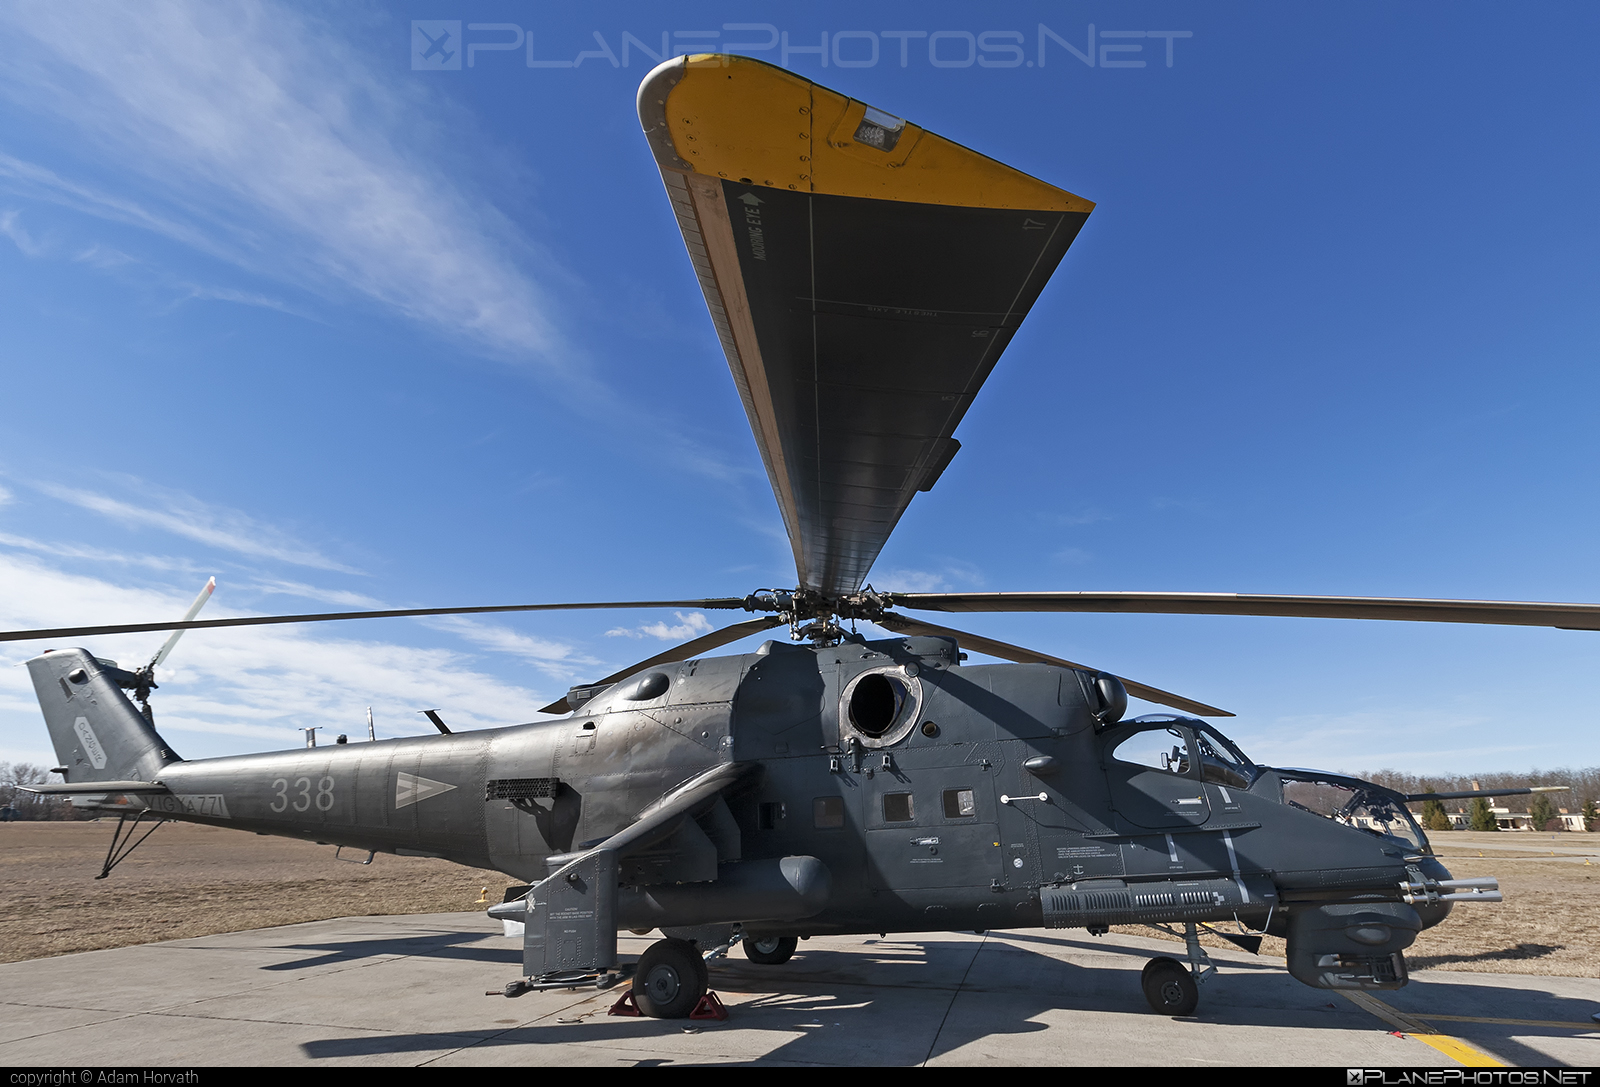 Mil Mi-24P - 338 operated by Magyar Légierő (Hungarian Air Force) #hungarianairforce #magyarlegiero #mi24 #mi24p #mil #mil24 #mil24p #milhelicopters